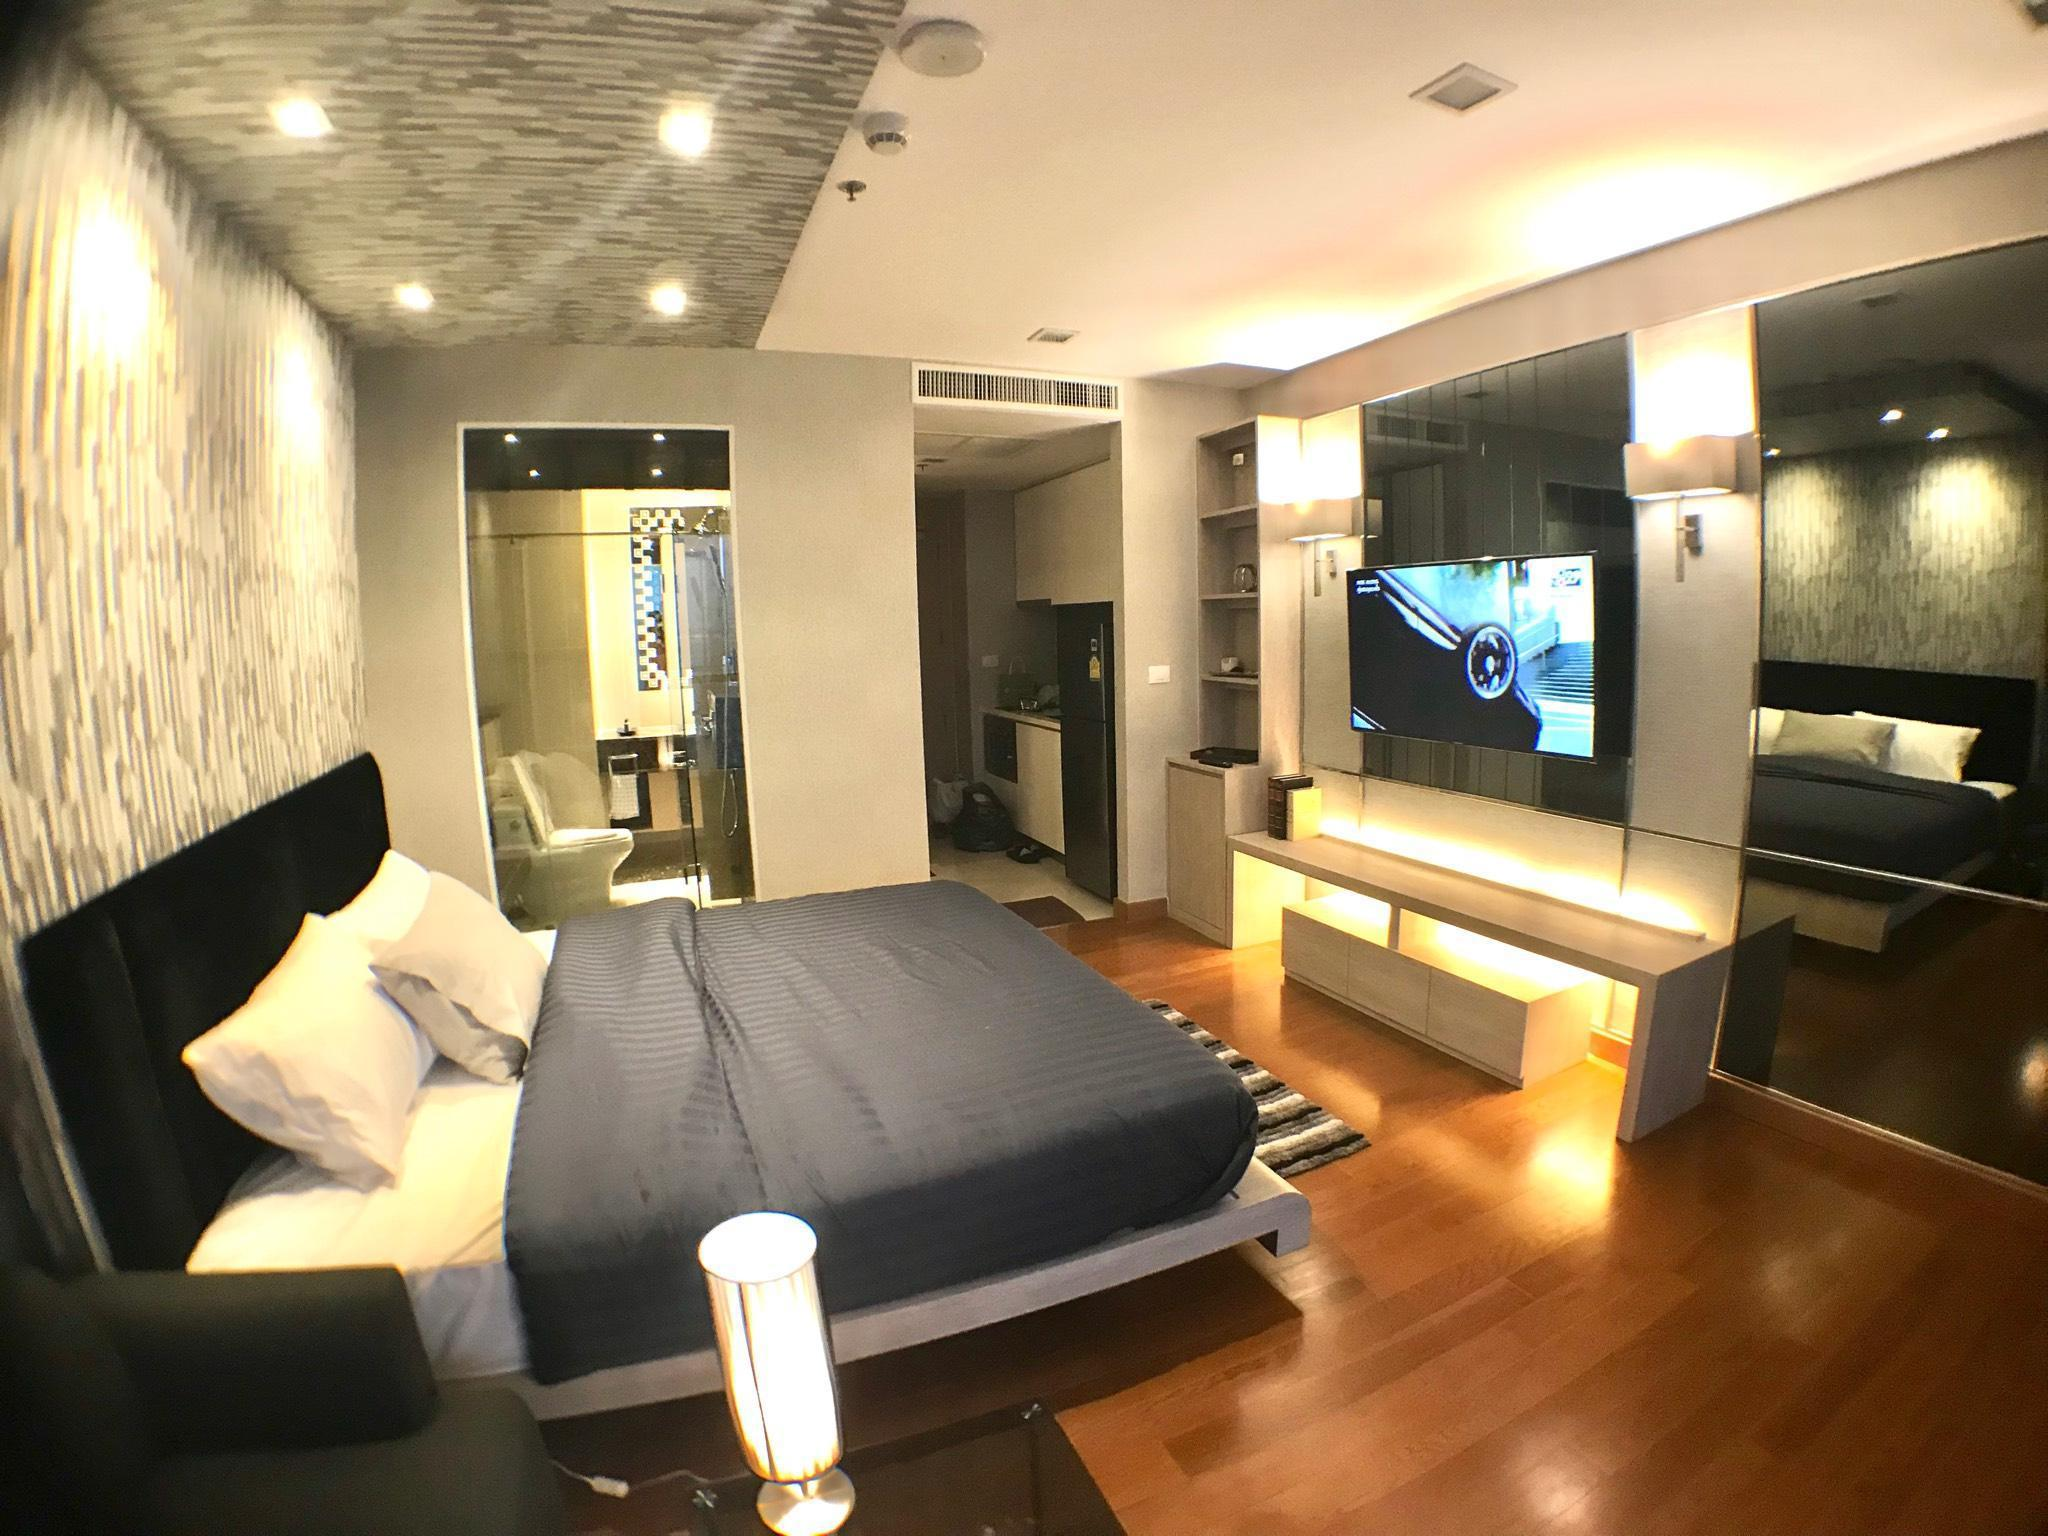 Luxury Apartment on Private Beachfront Pattaya! อพาร์ตเมนต์ 1 ห้องนอน 1 ห้องน้ำส่วนตัว ขนาด 35 ตร.ม. – นาเกลือ/บางละมุง